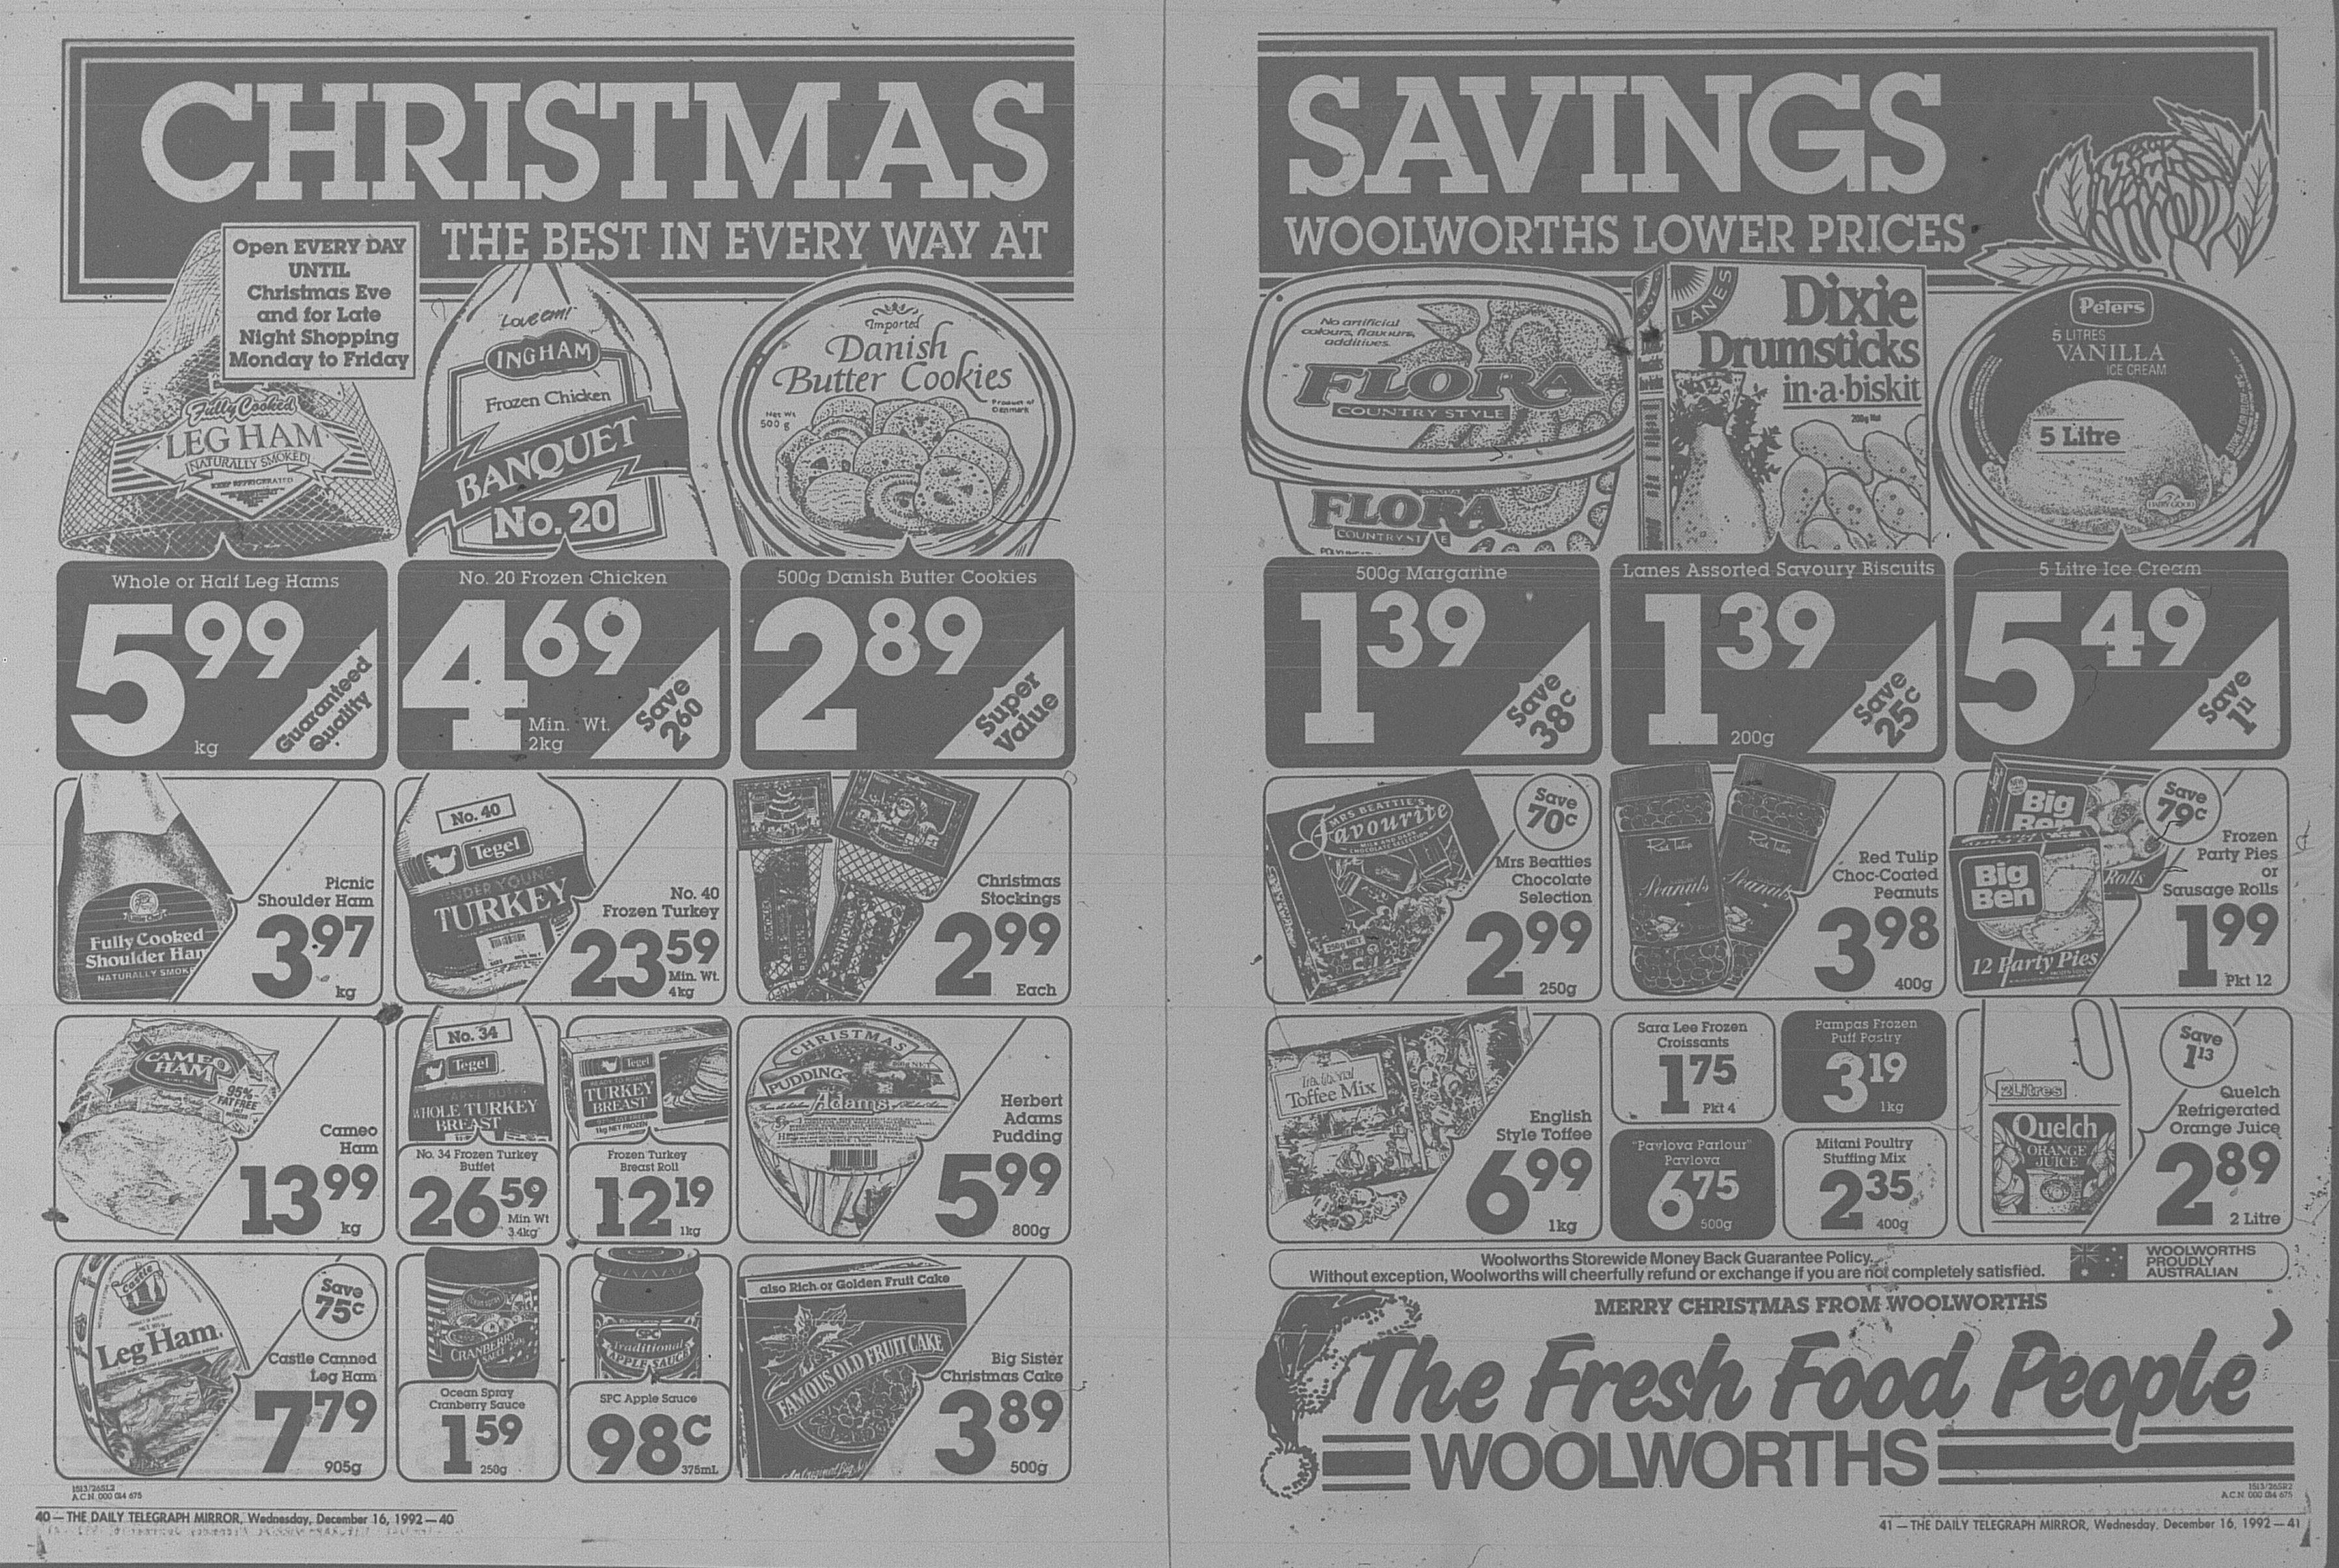 December 1992 daily telegraph 0005 (2)